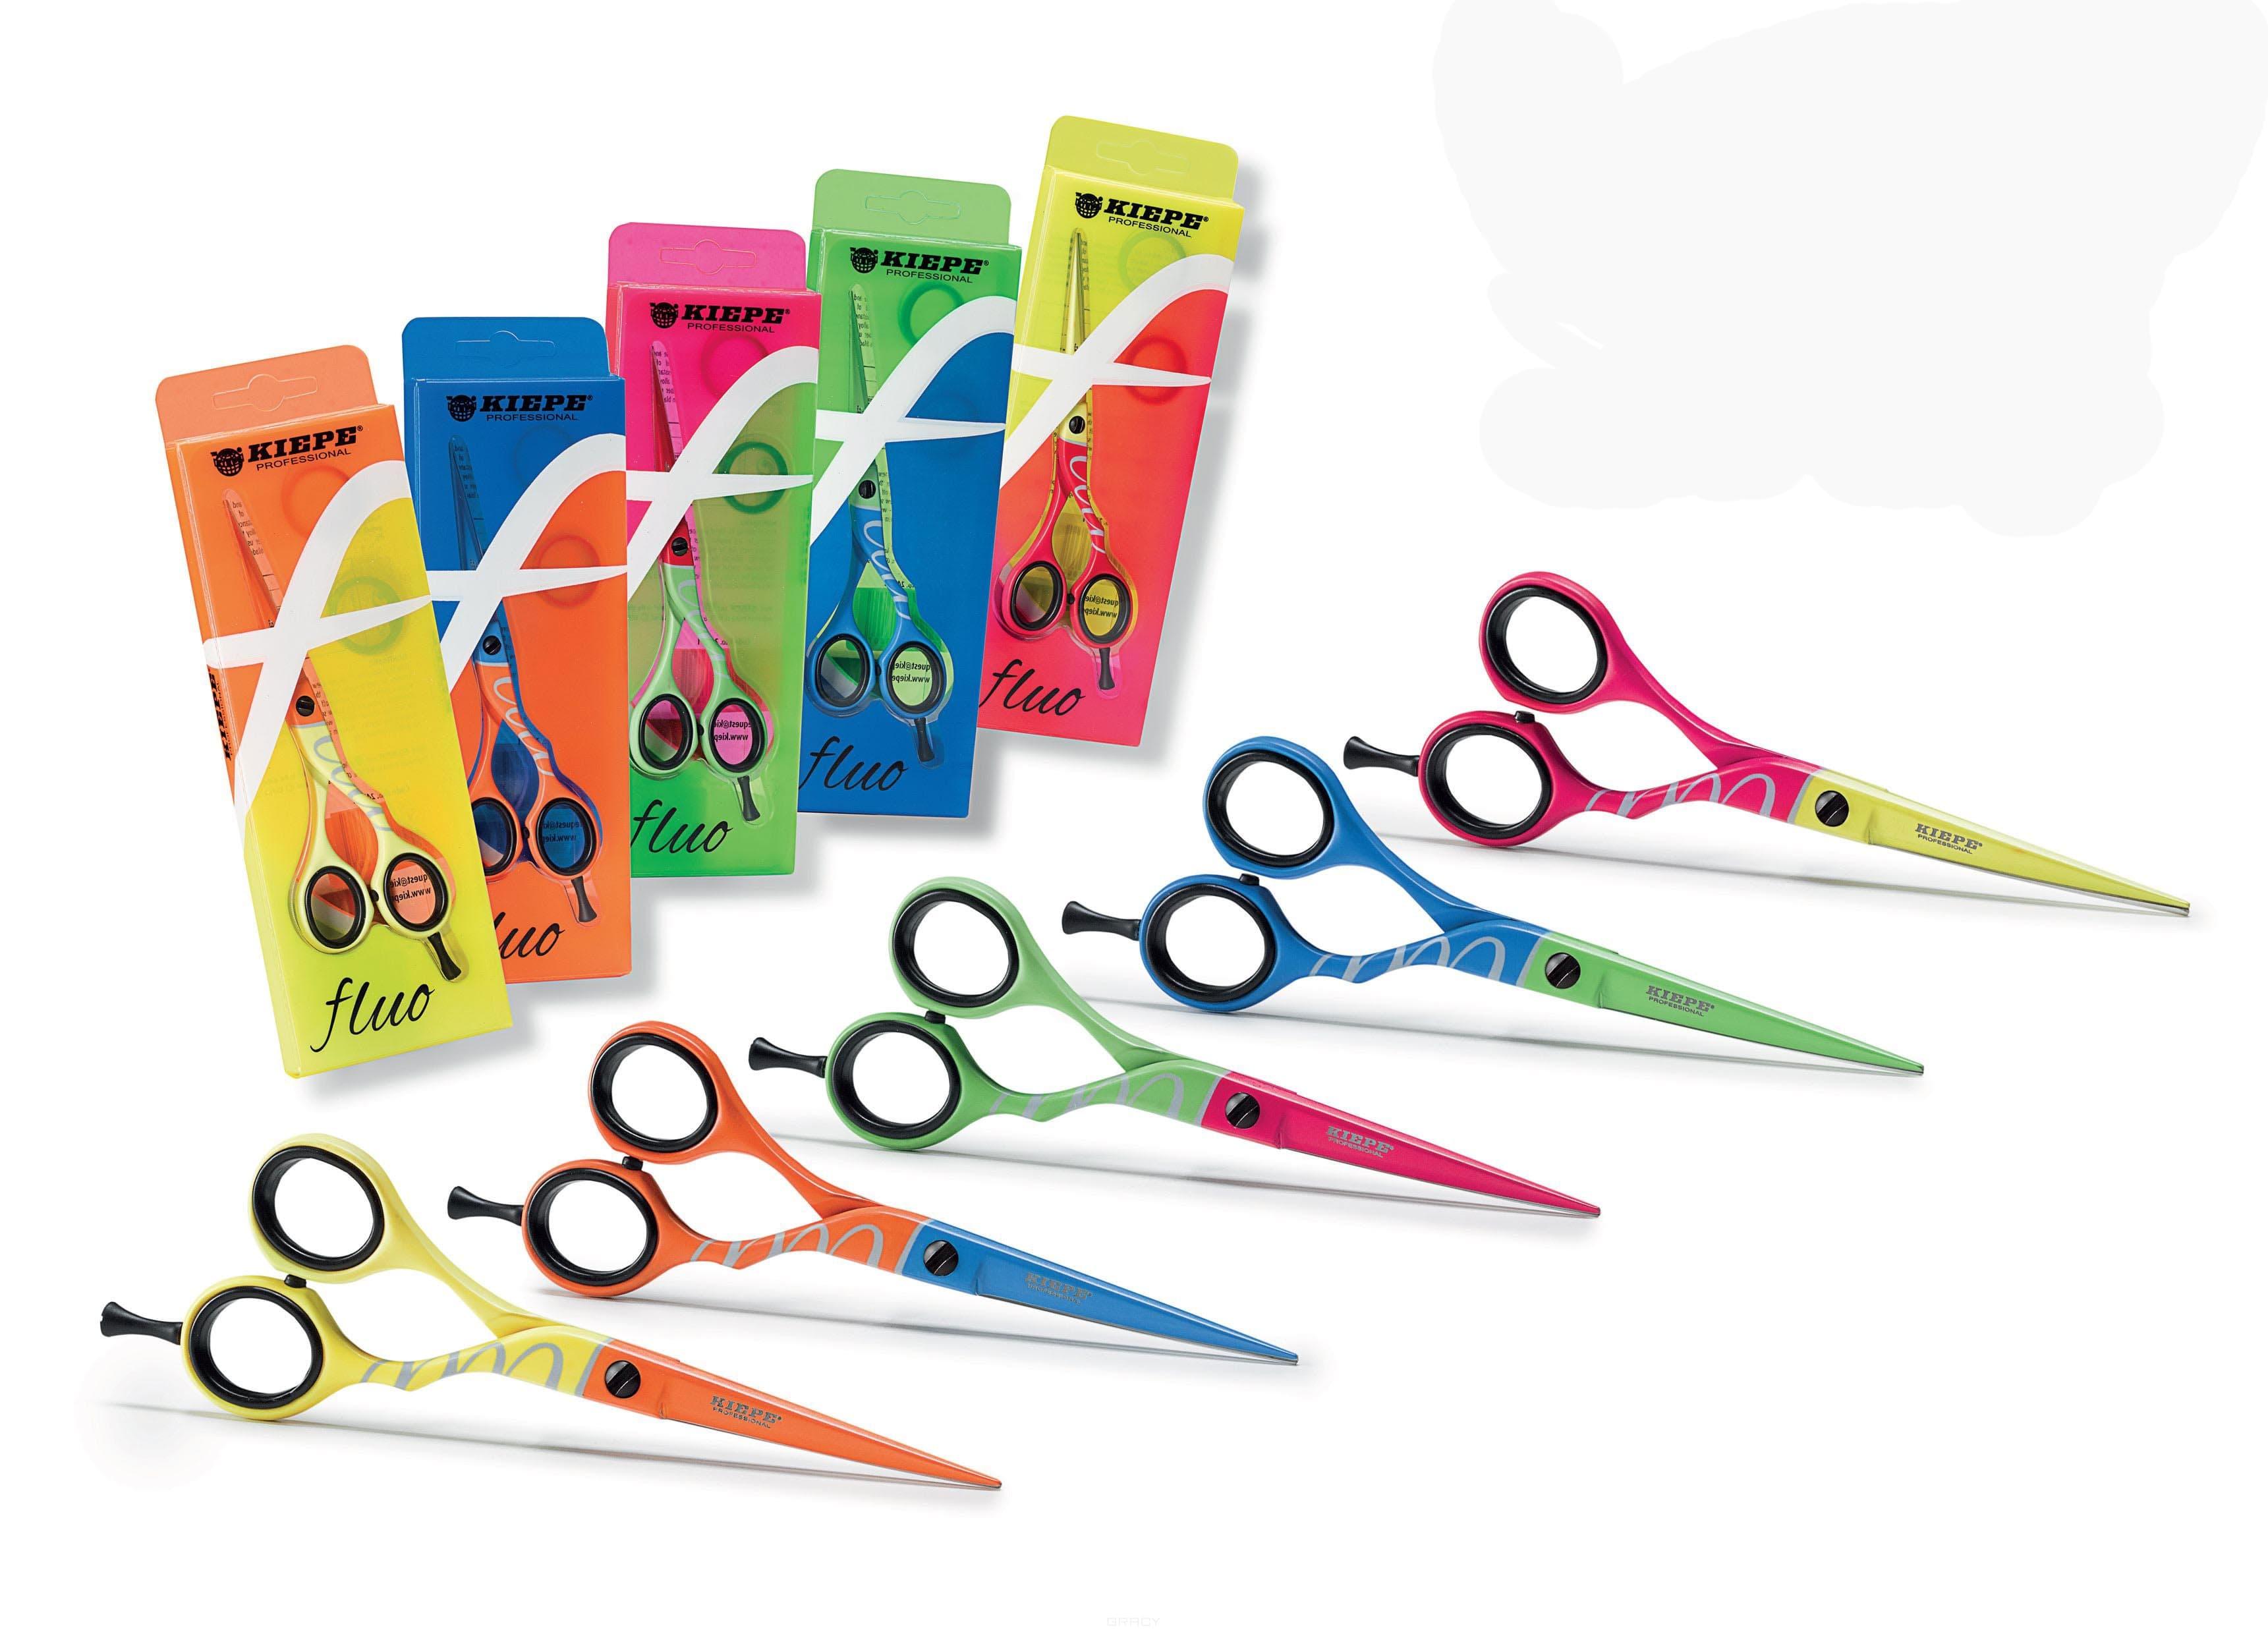 Kiepe Ножницы прямые 5,5 Fluo (4 цвета), 1 шт, зелено-синие 2438-55-2 kiepe ножницы прямые 5 5 пластиковые ручки 2312 5 5